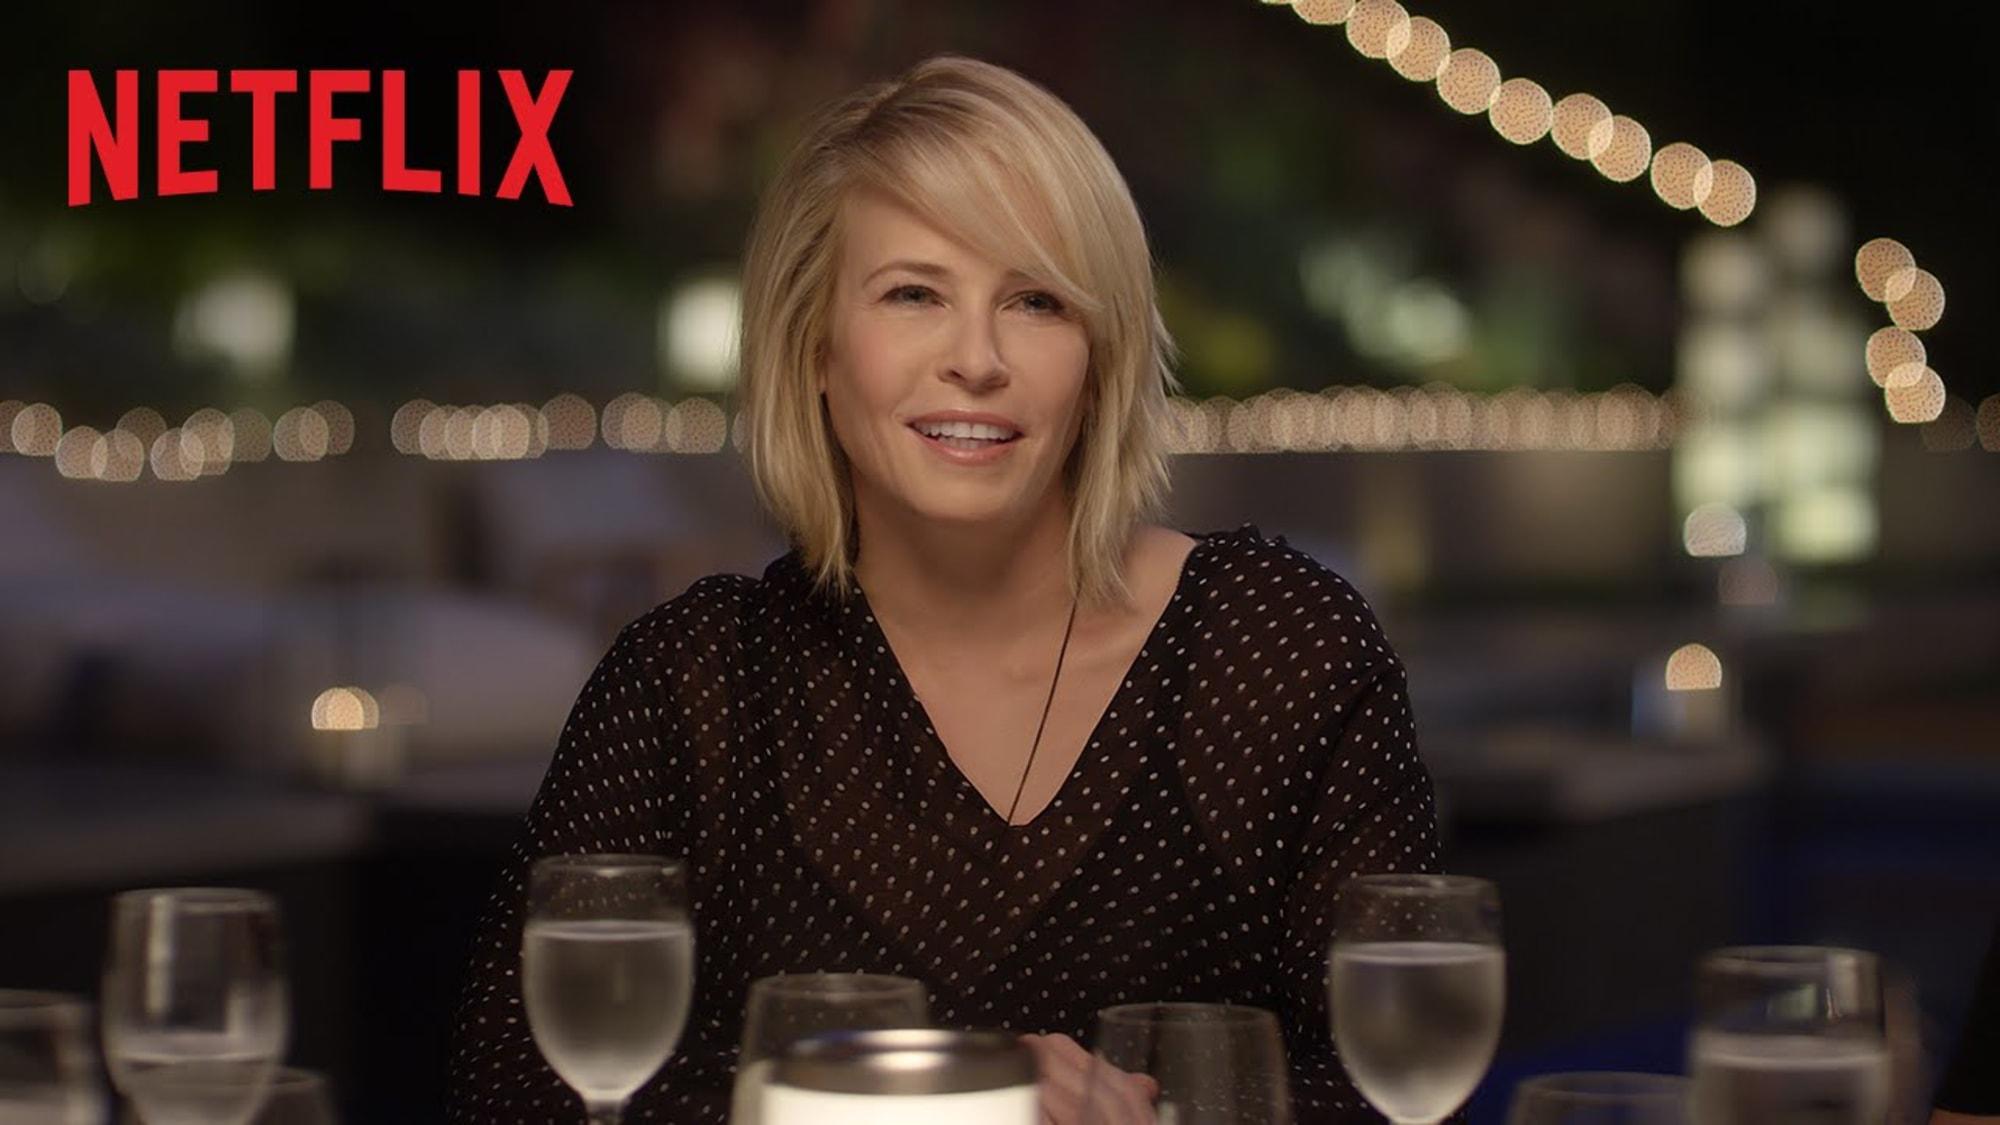 Chelsea Netflix